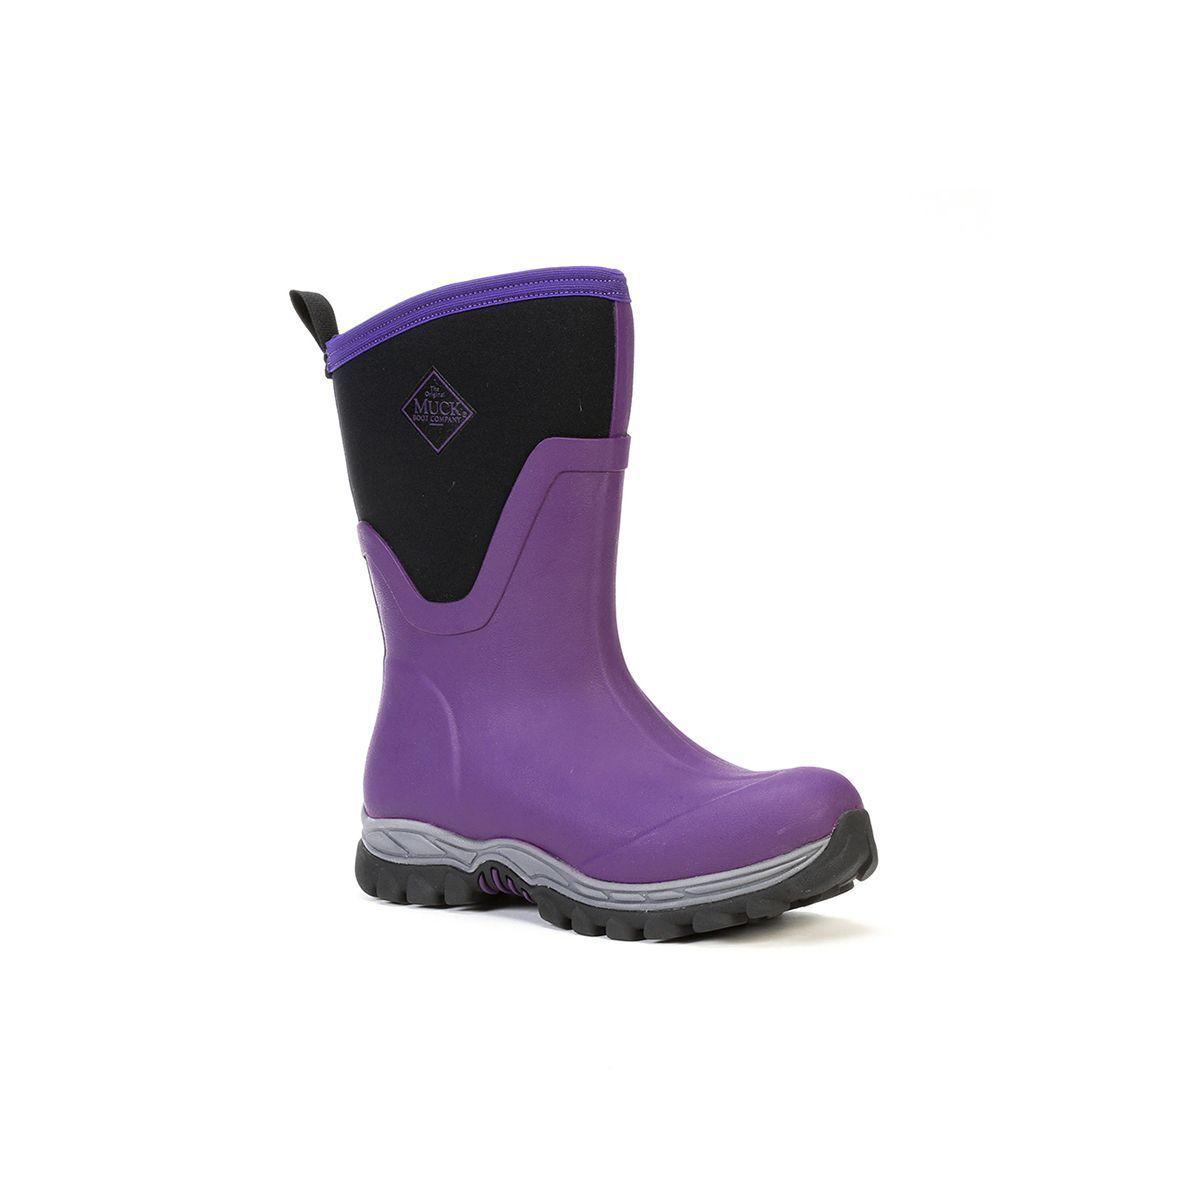 Muck Boots Company Women's ARCTIC SPORT II MID, ACAI PURPLE, Neoprene Rubber